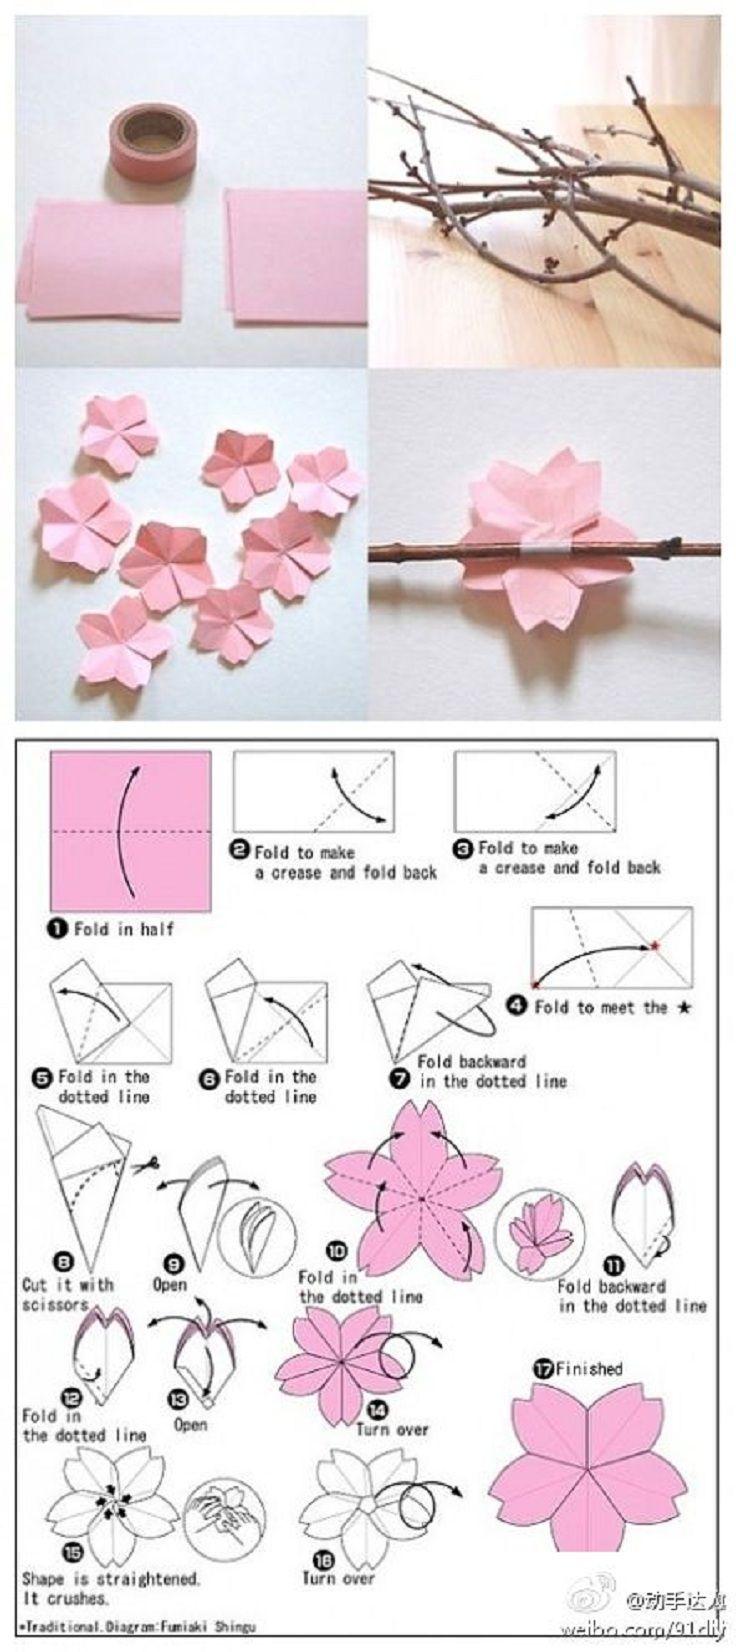 Tissue Paper Cherry Blossom Tree Cherry Blossom Party Paper Flowers Tissue Paper Flowers